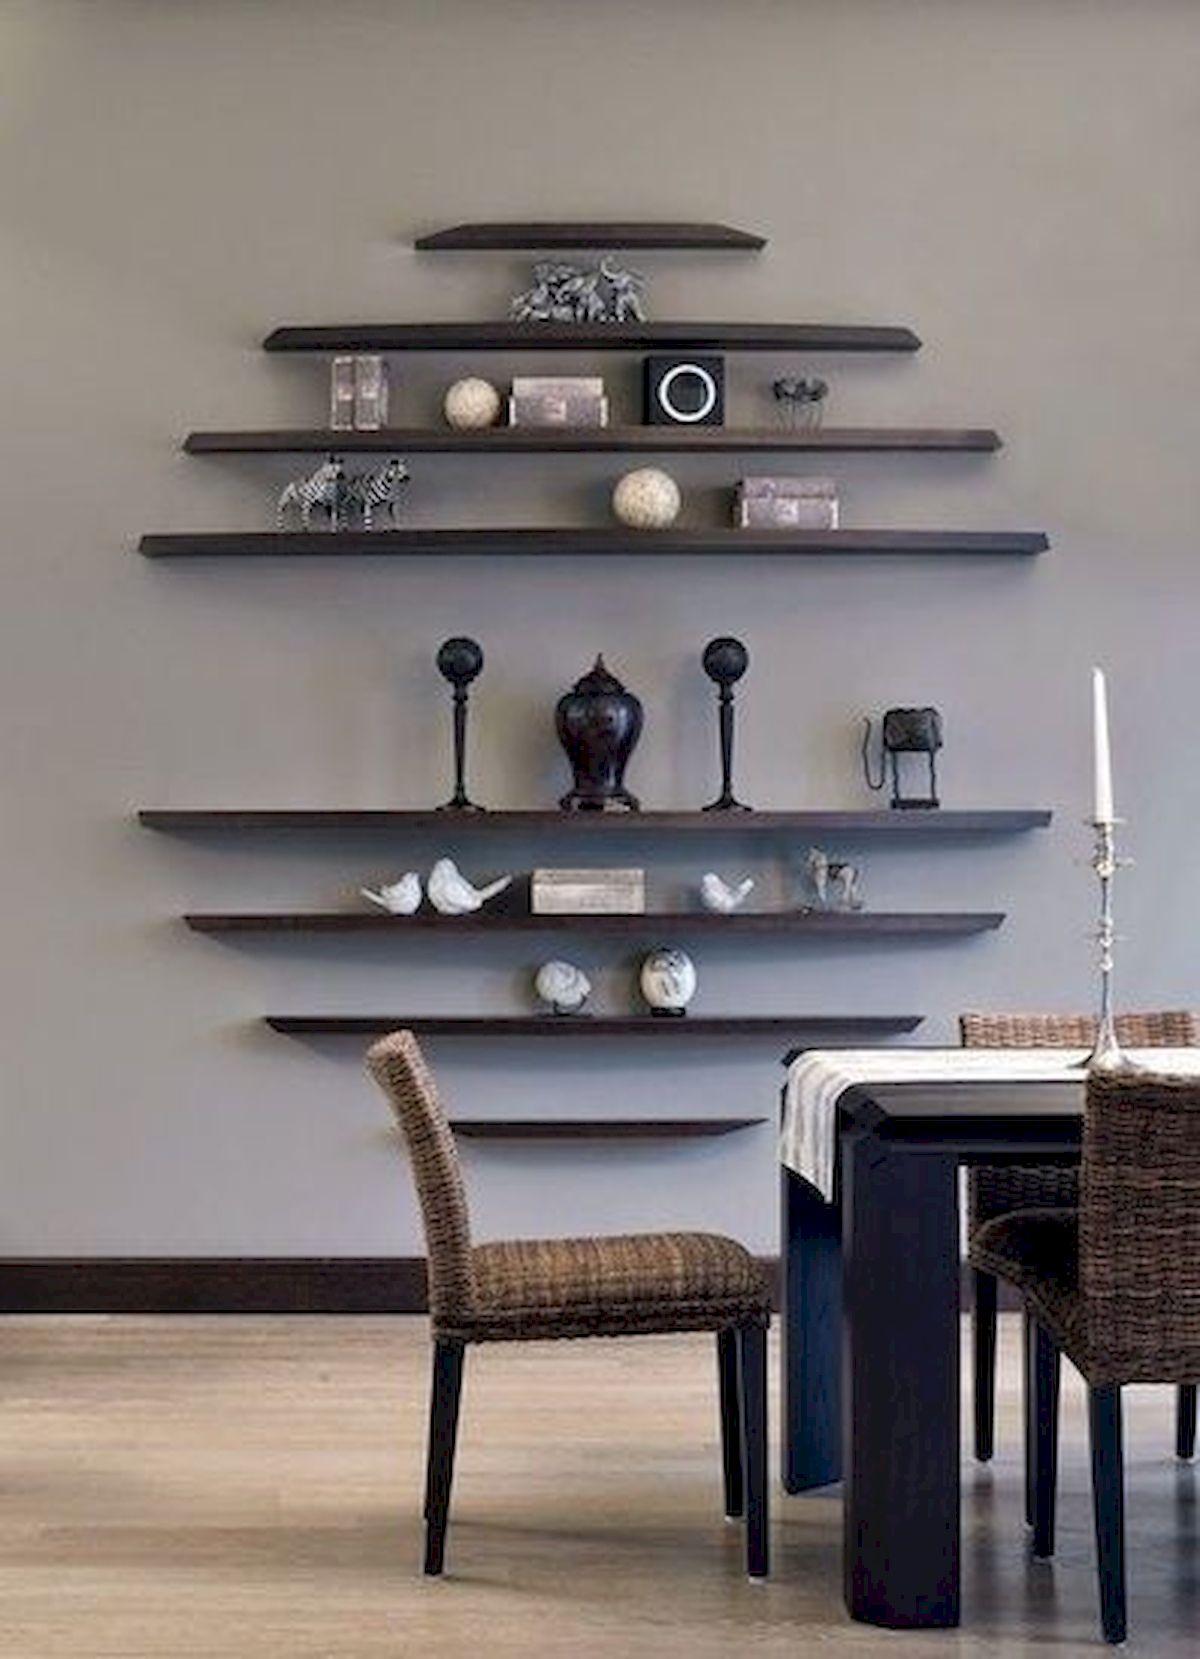 Hanging Shelves as Modern Decoration